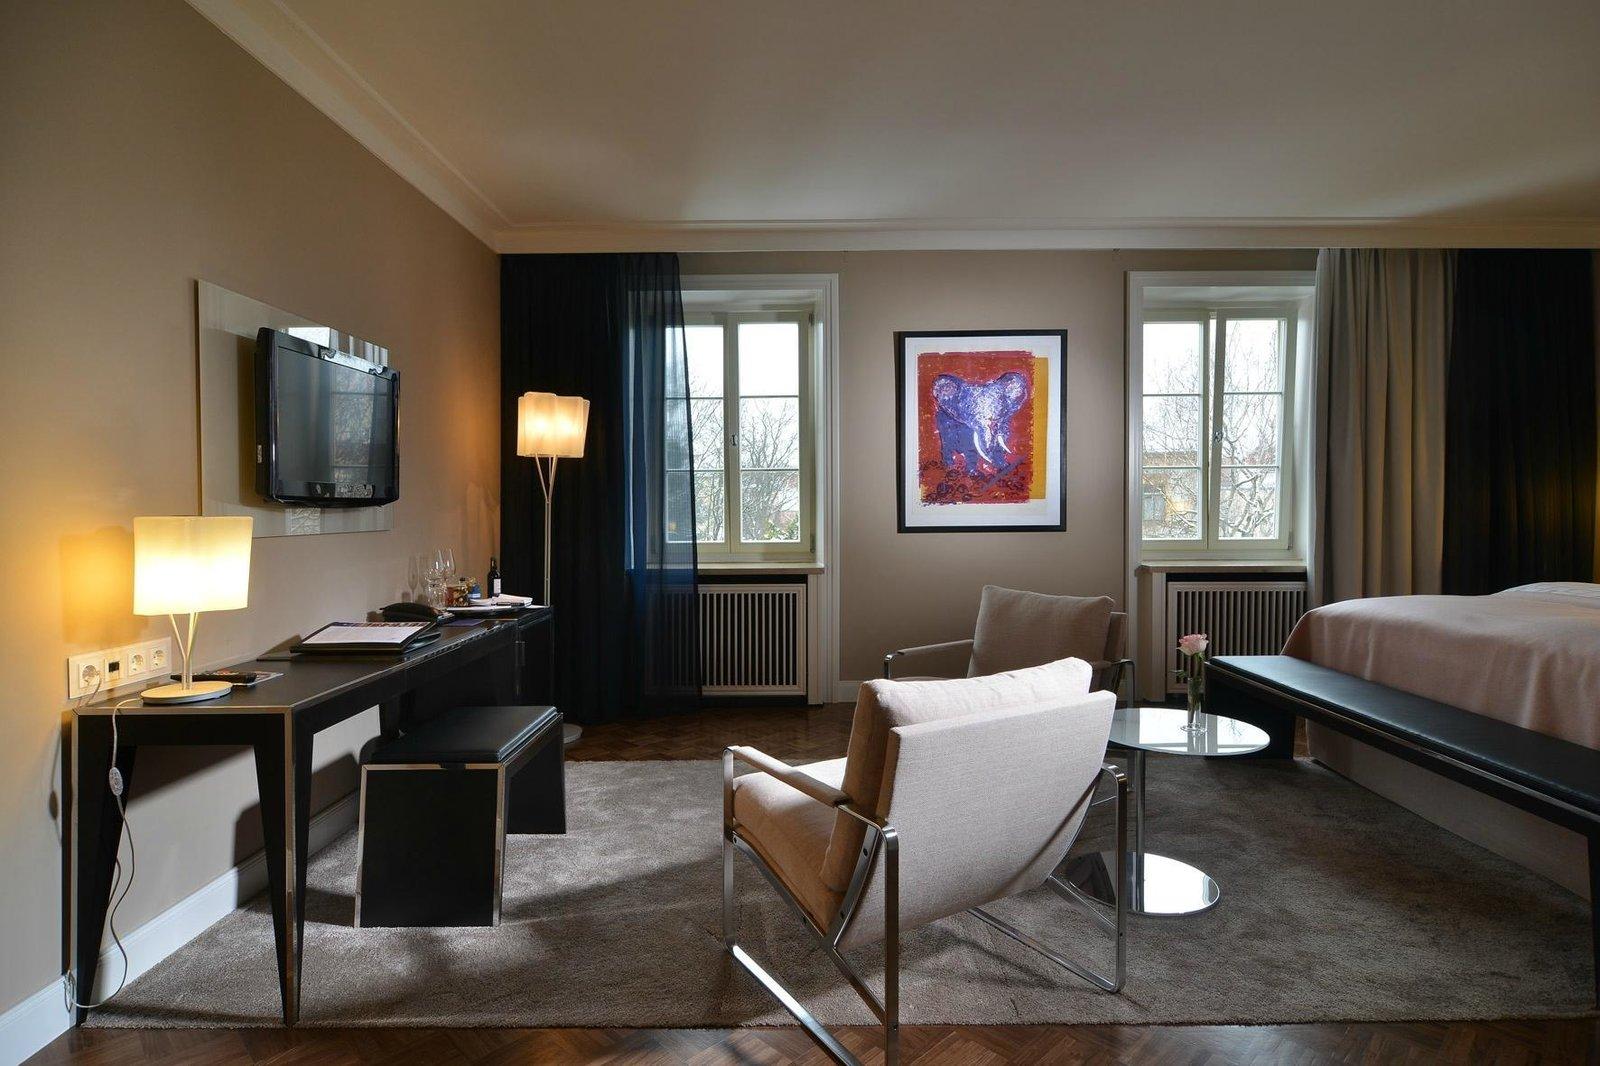 Bedroom, Floor Lighting, Medium Hardwood Floor, Rug Floor, Bed, and Chair  Hotel Elephant